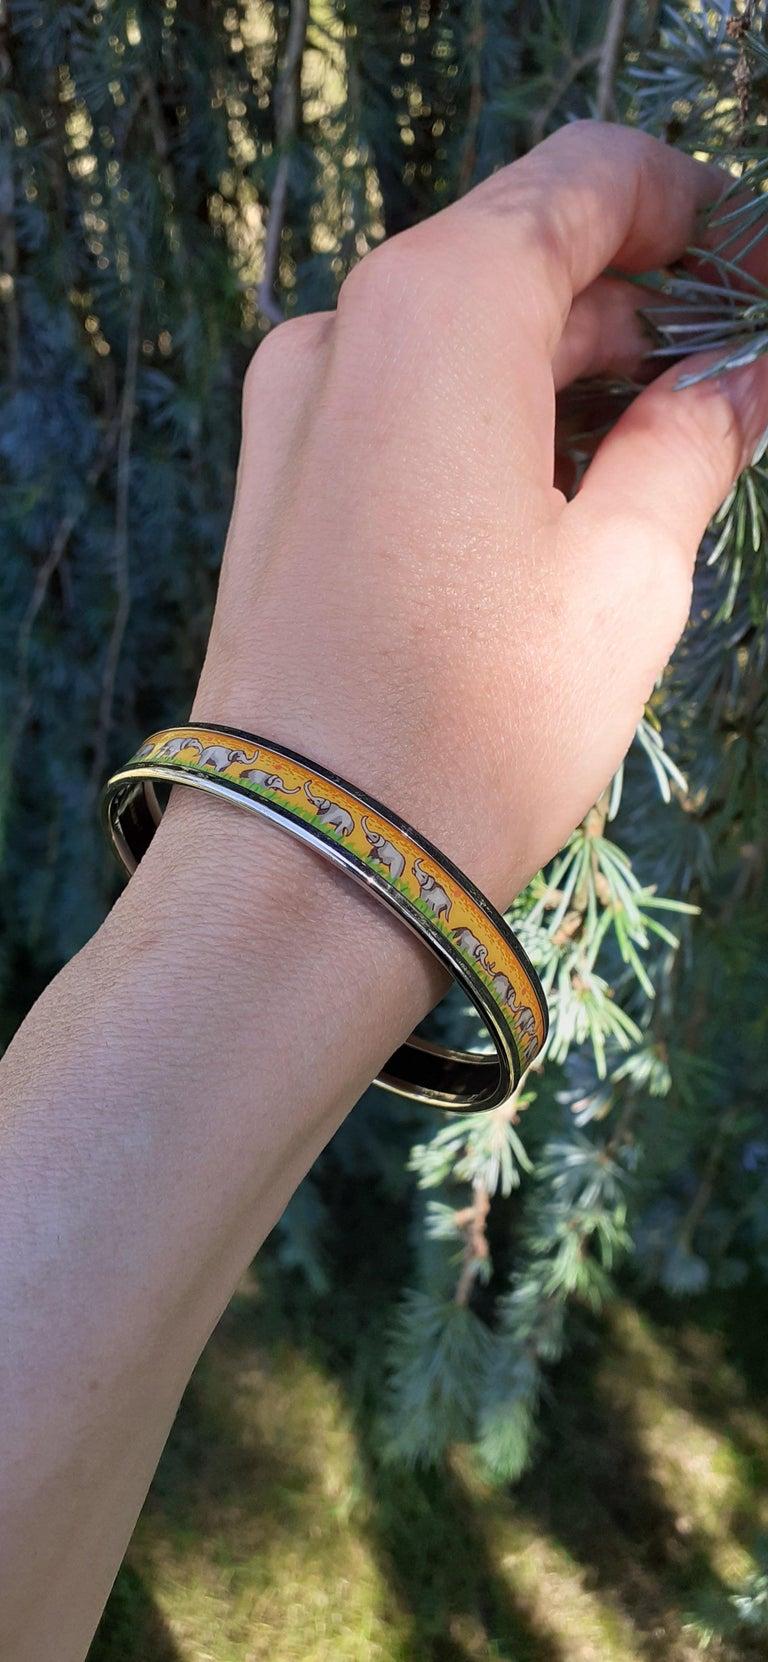 Hermès Enamel Printed Bracelet Elephants Grazing Yellow Phw Narrow Size 65 For Sale 9